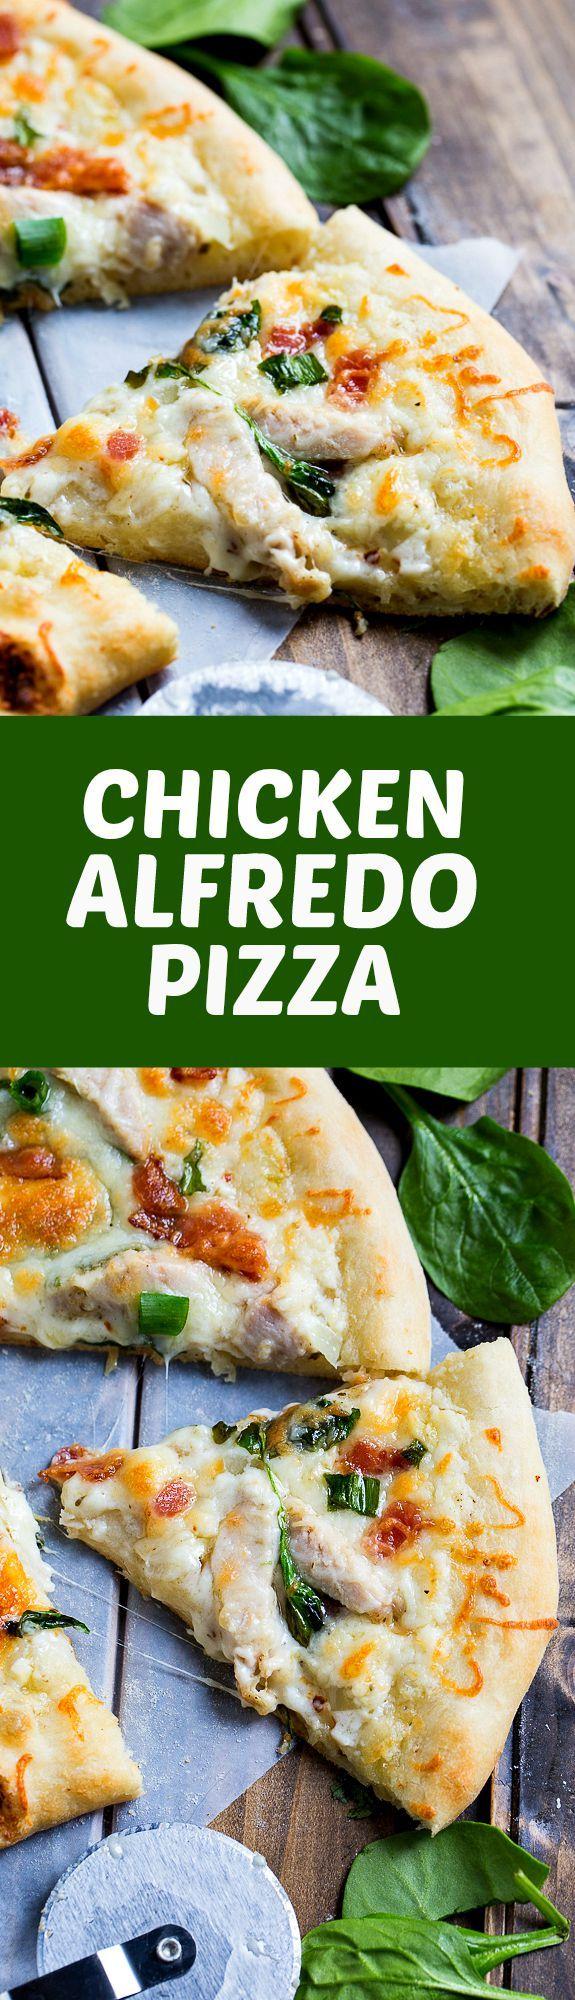 Chicken Alfredo Pizza - Garlic butter and a creamy alfredo sauce make this one delicious pizza!